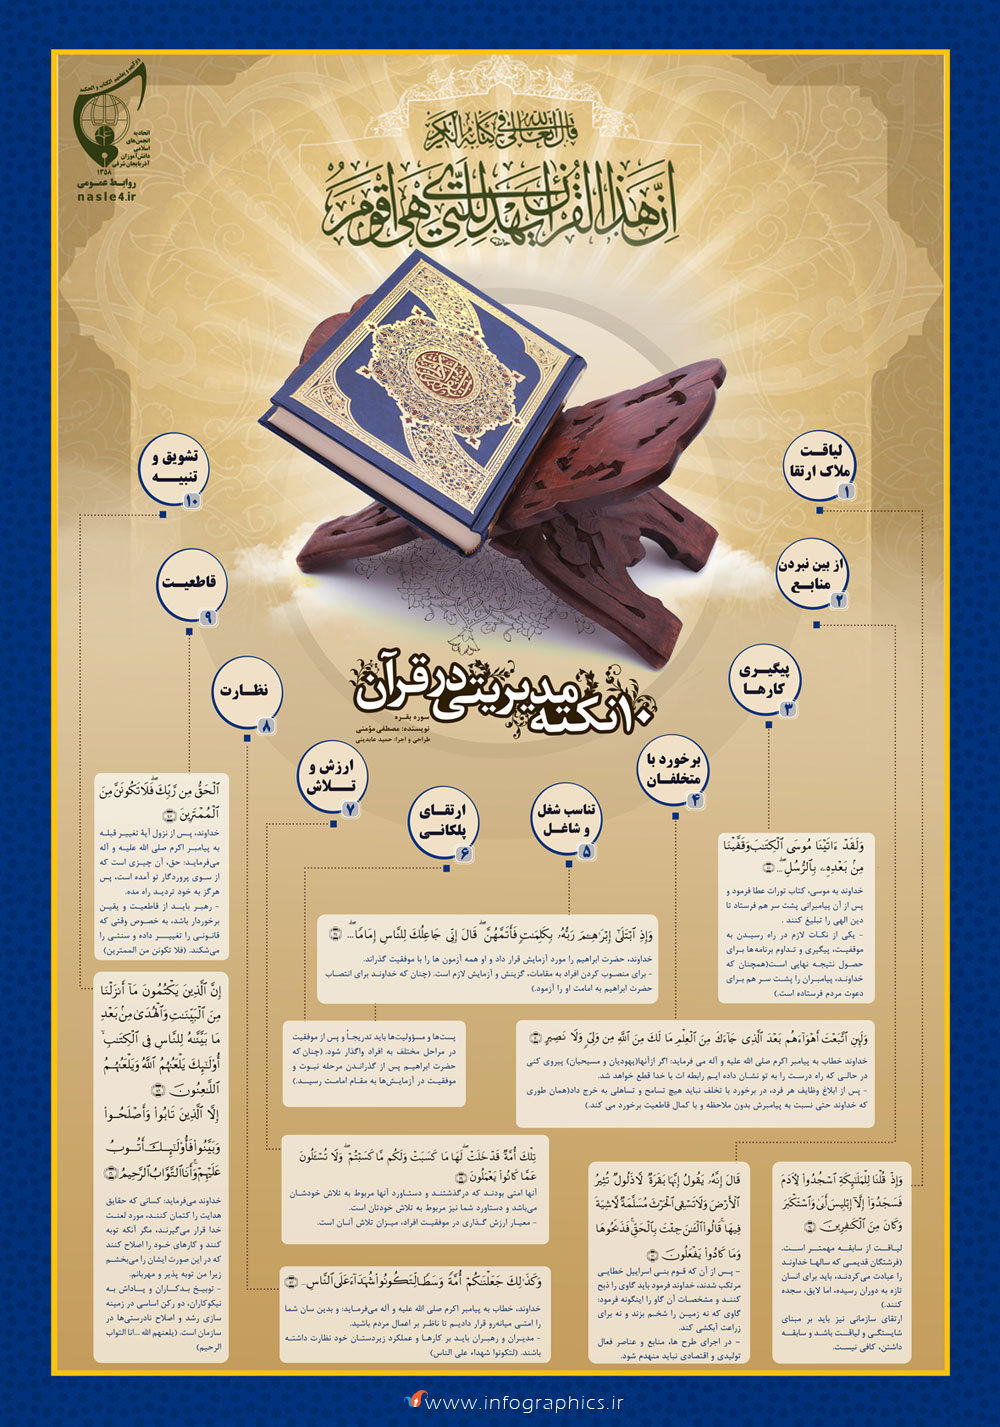 ۱۳۵۹۳۱۲۴۲۴_quran-tips-infographic_l